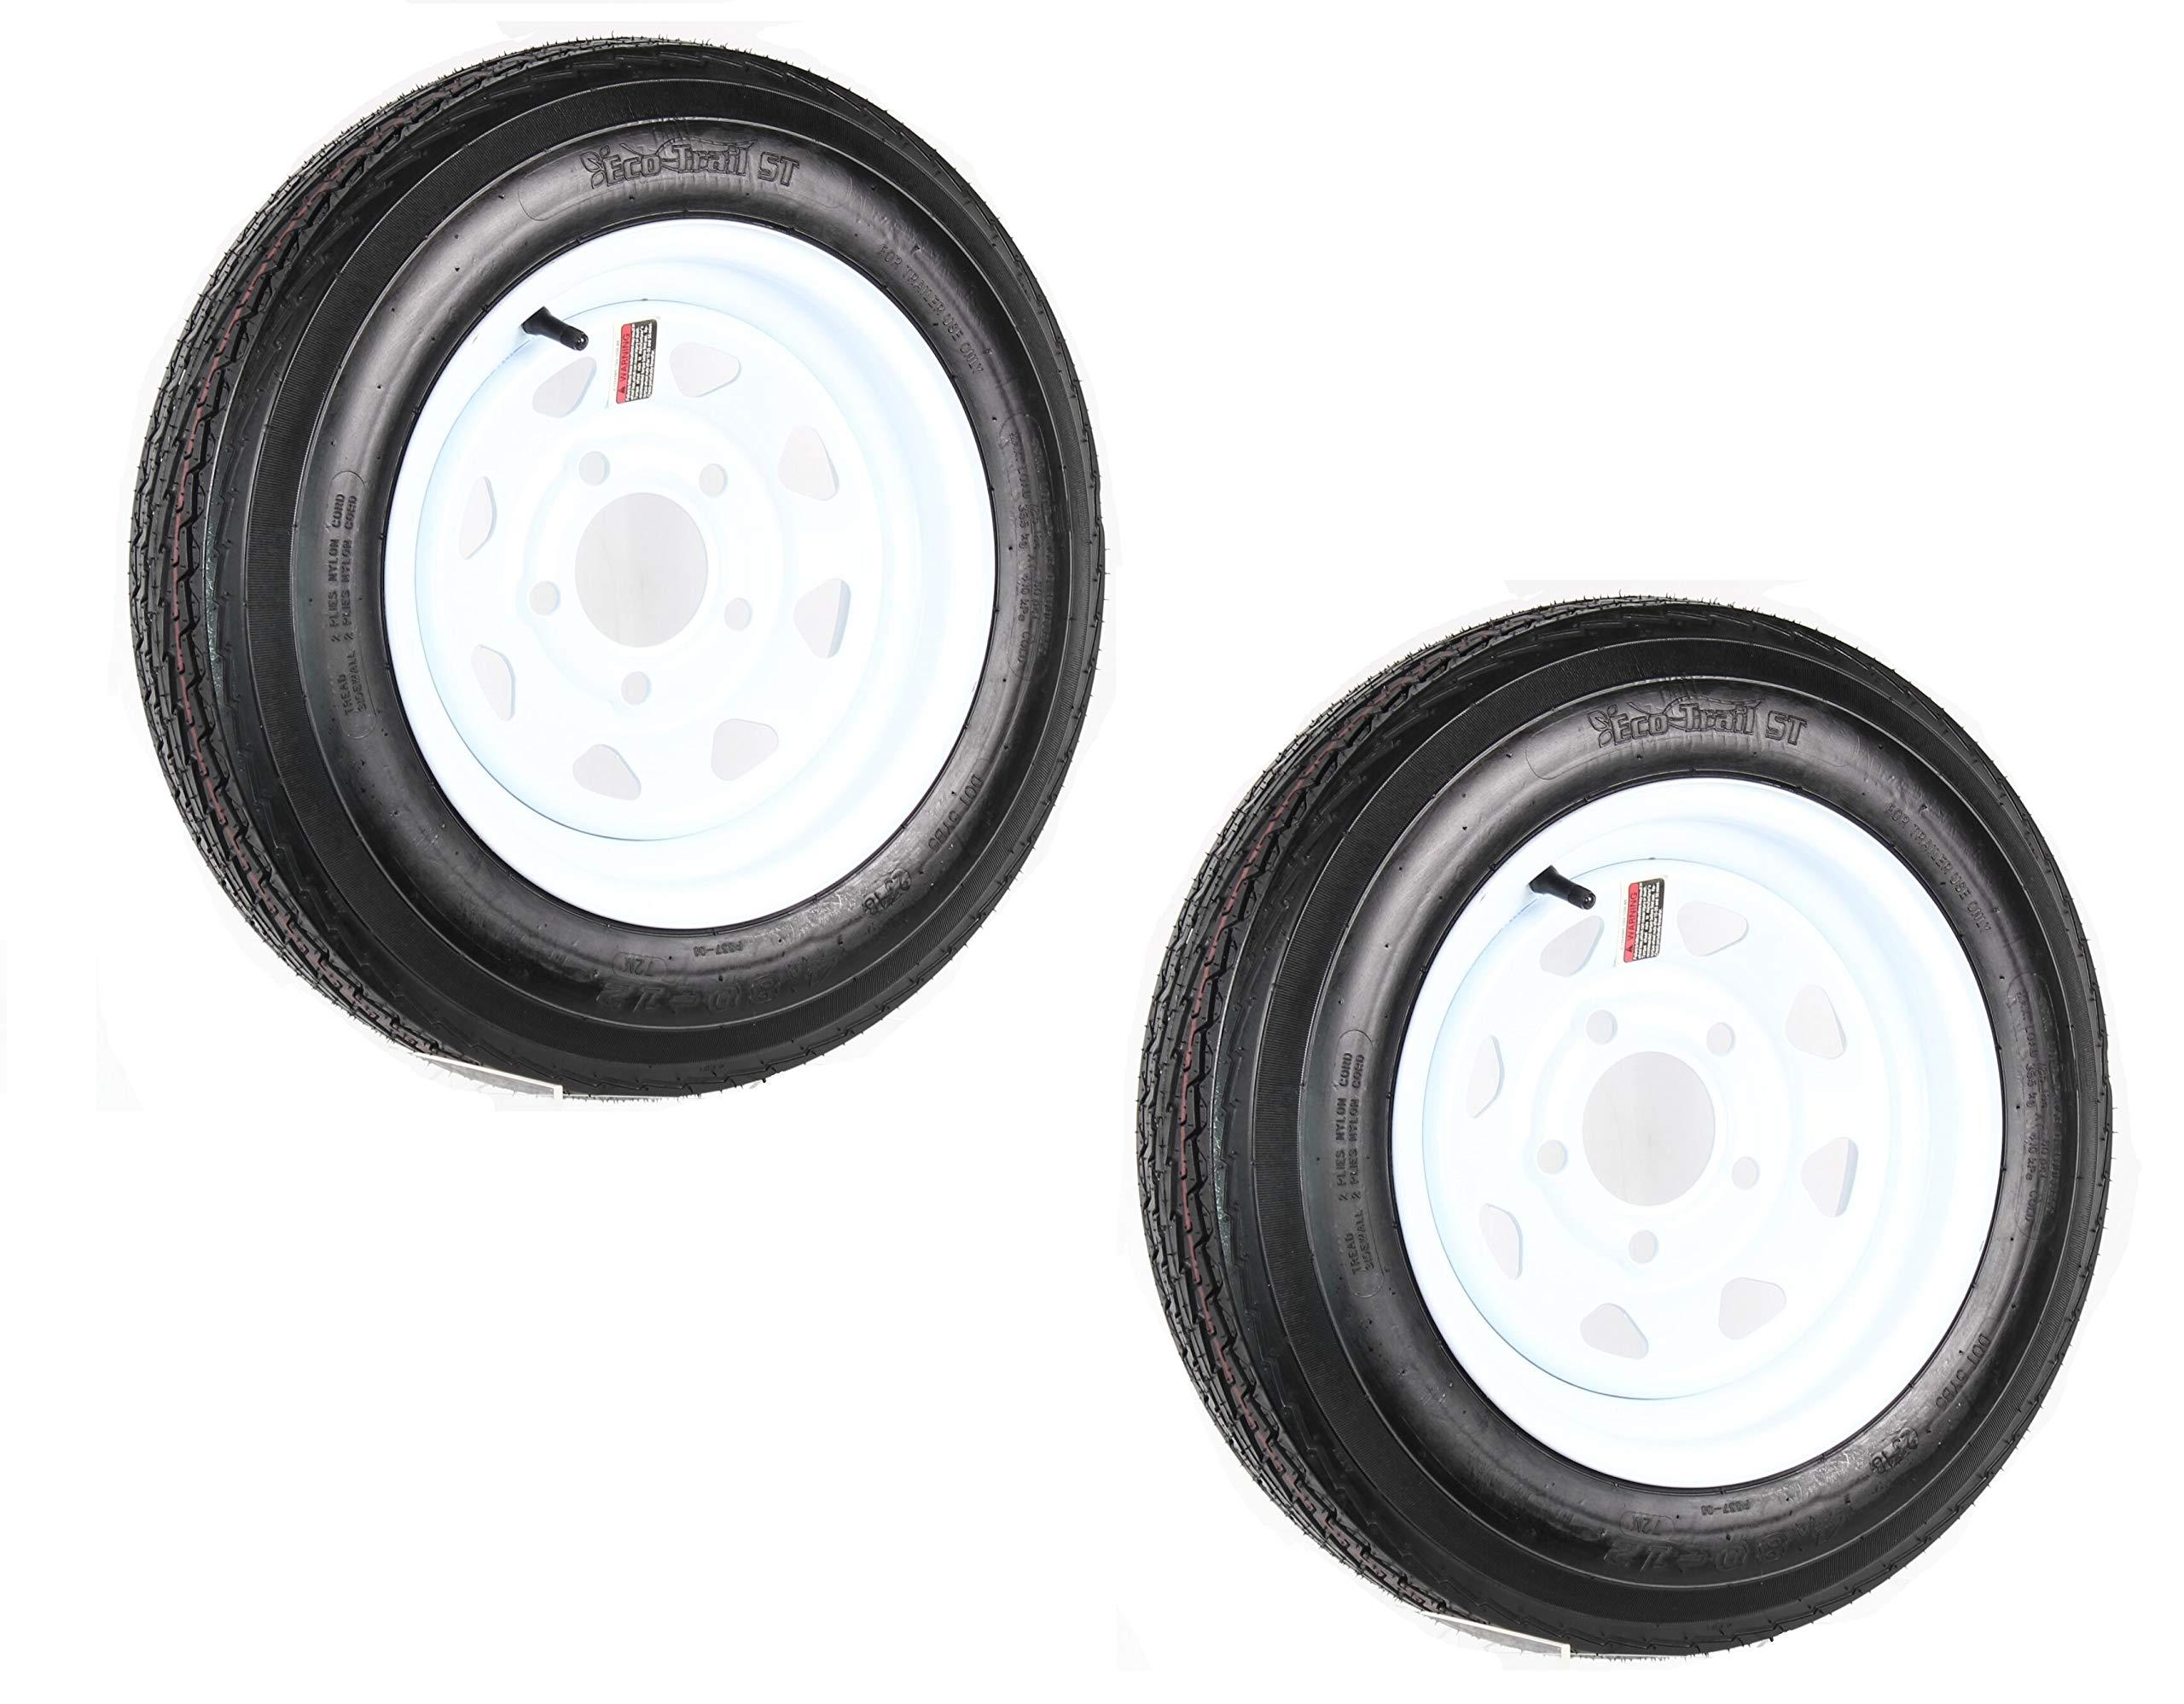 eCustomRim Two Trailer Tires On Rims 4.80-12 480-12 4.80 X 12 LRB 5Lug Wheel White Spoke